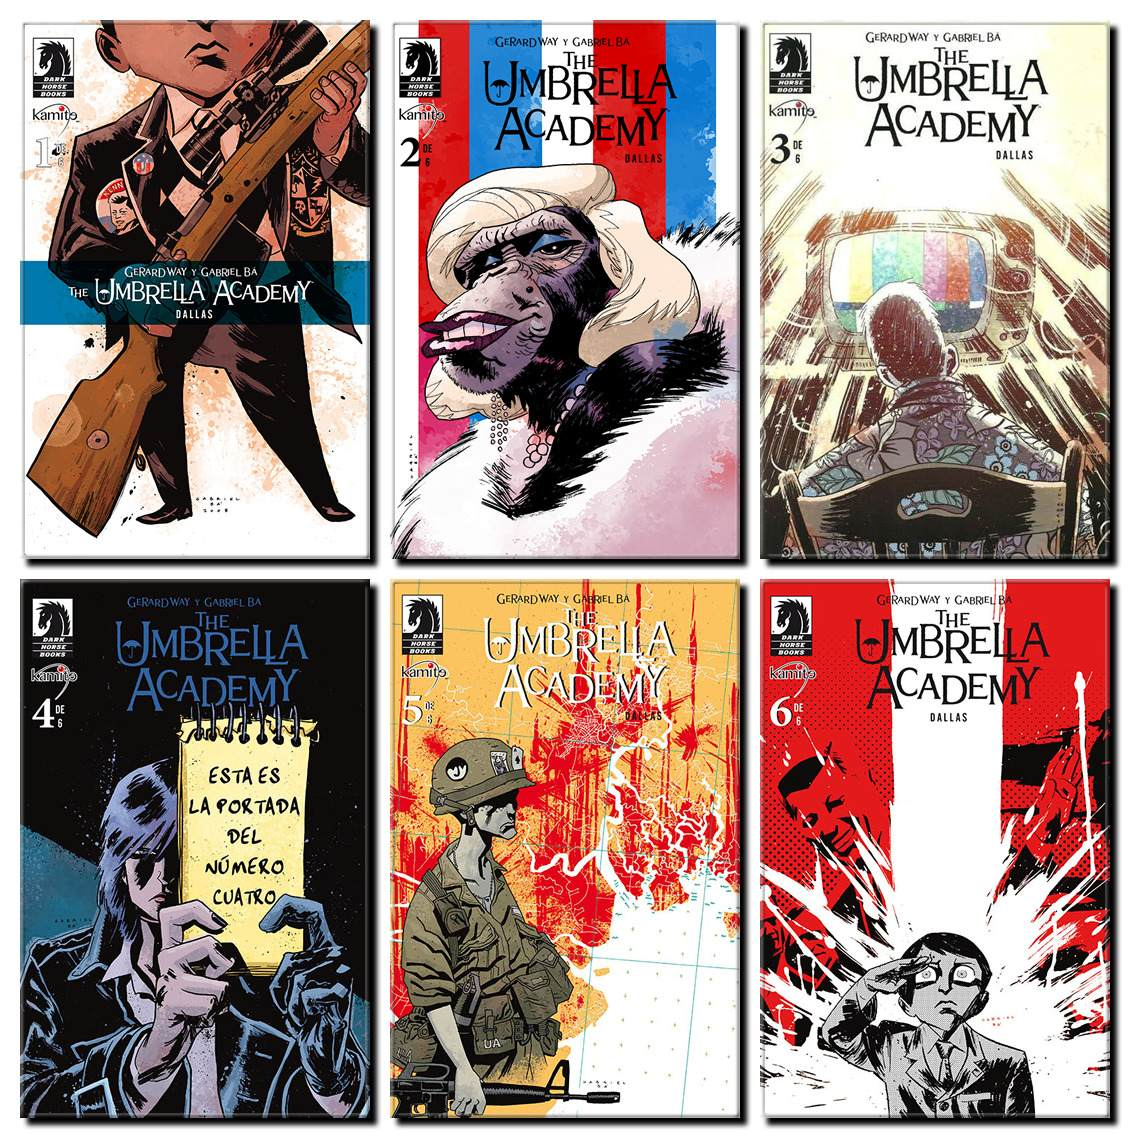 Comic The Umbrella Academy Dallas My Chemical Romance